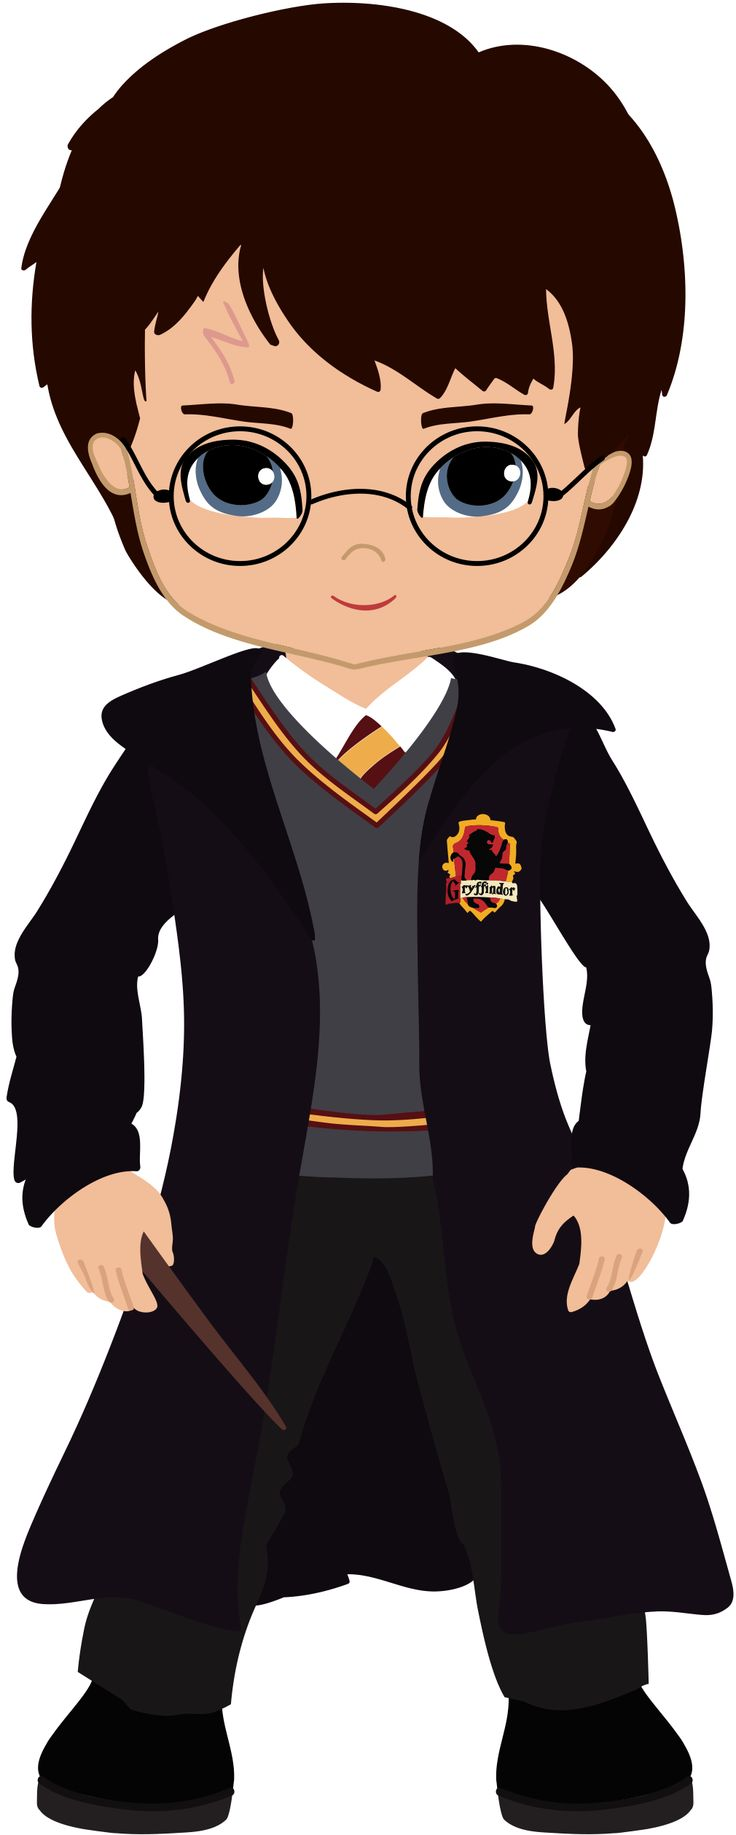 Hair clipart harry potter Harry potter Princesas clip da